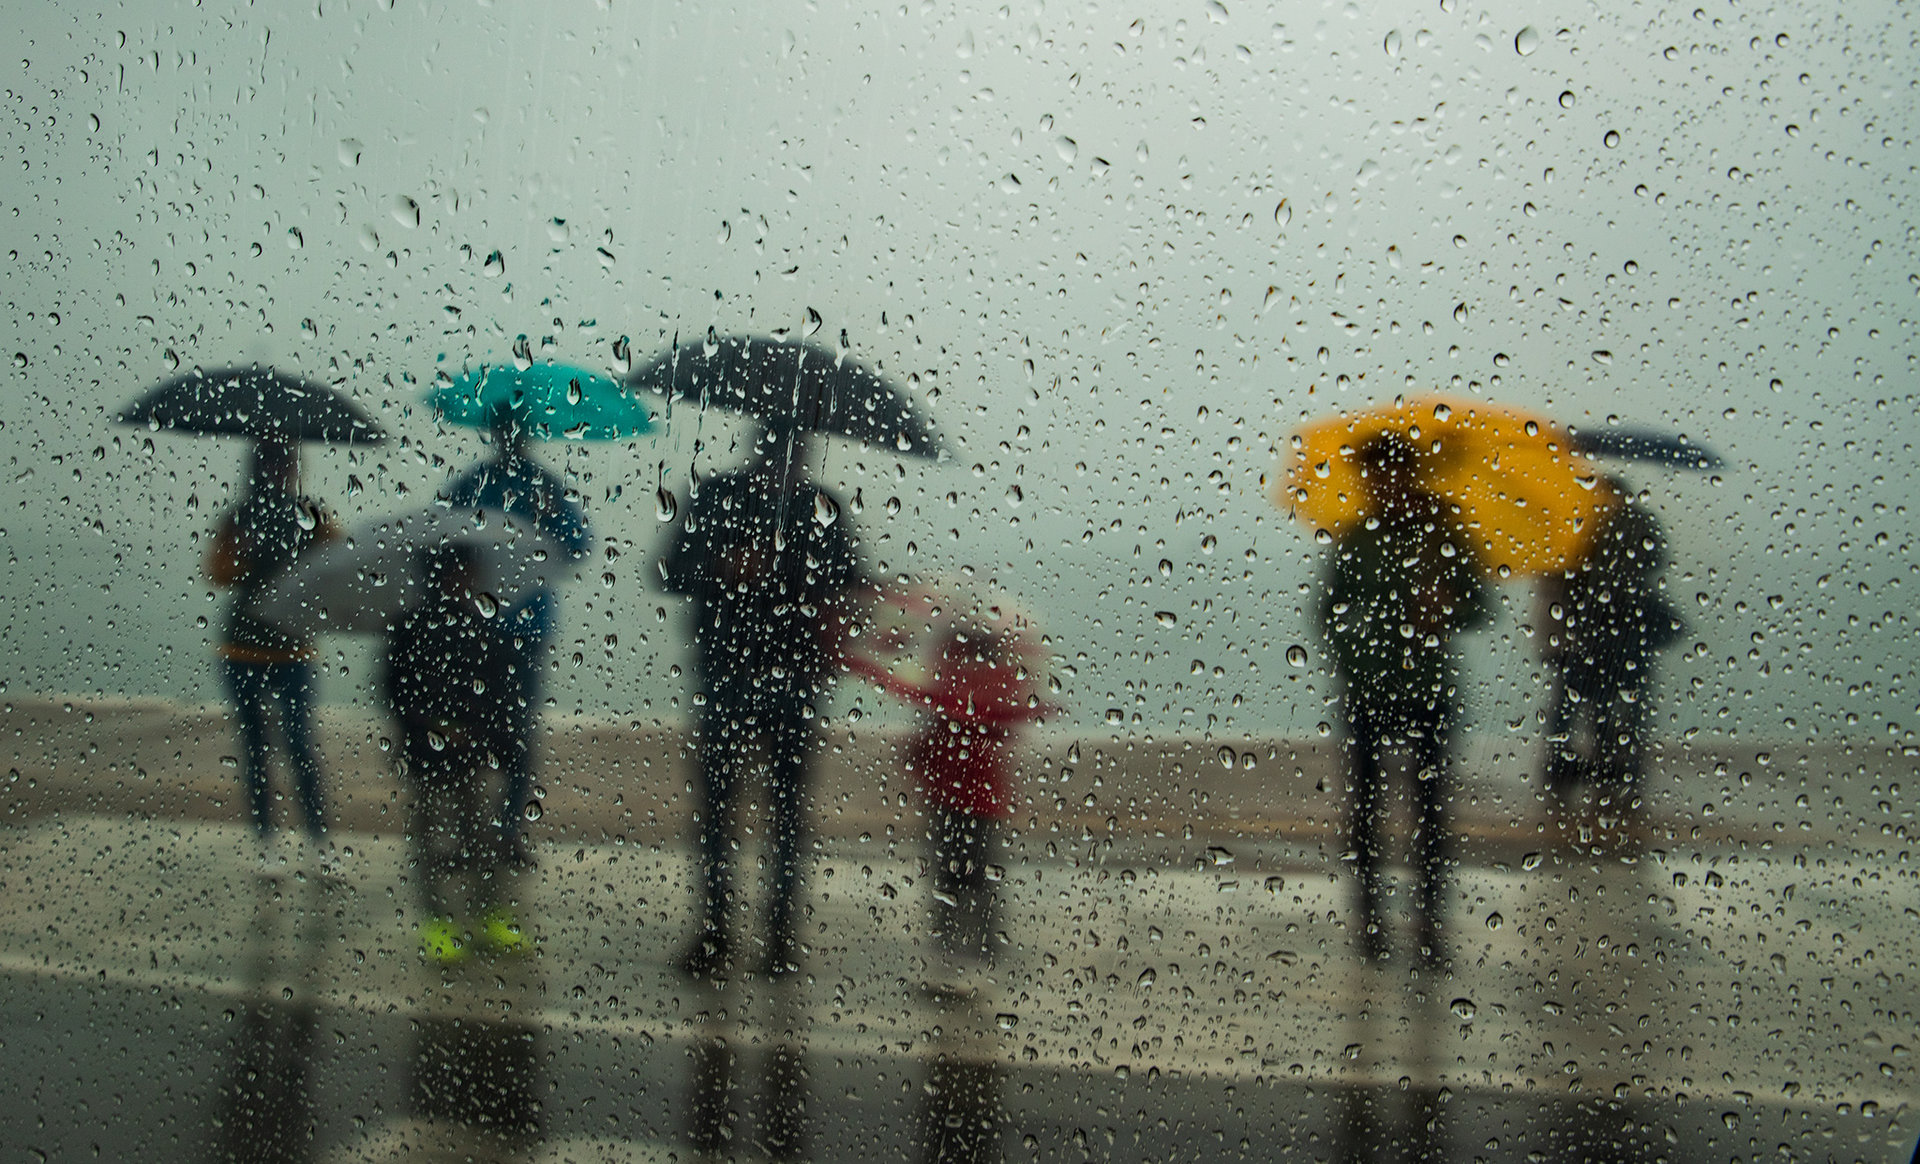 Колорит в дъжда | Author TEODORA IVANOVA - dorascal18 | PHOTO FORUM